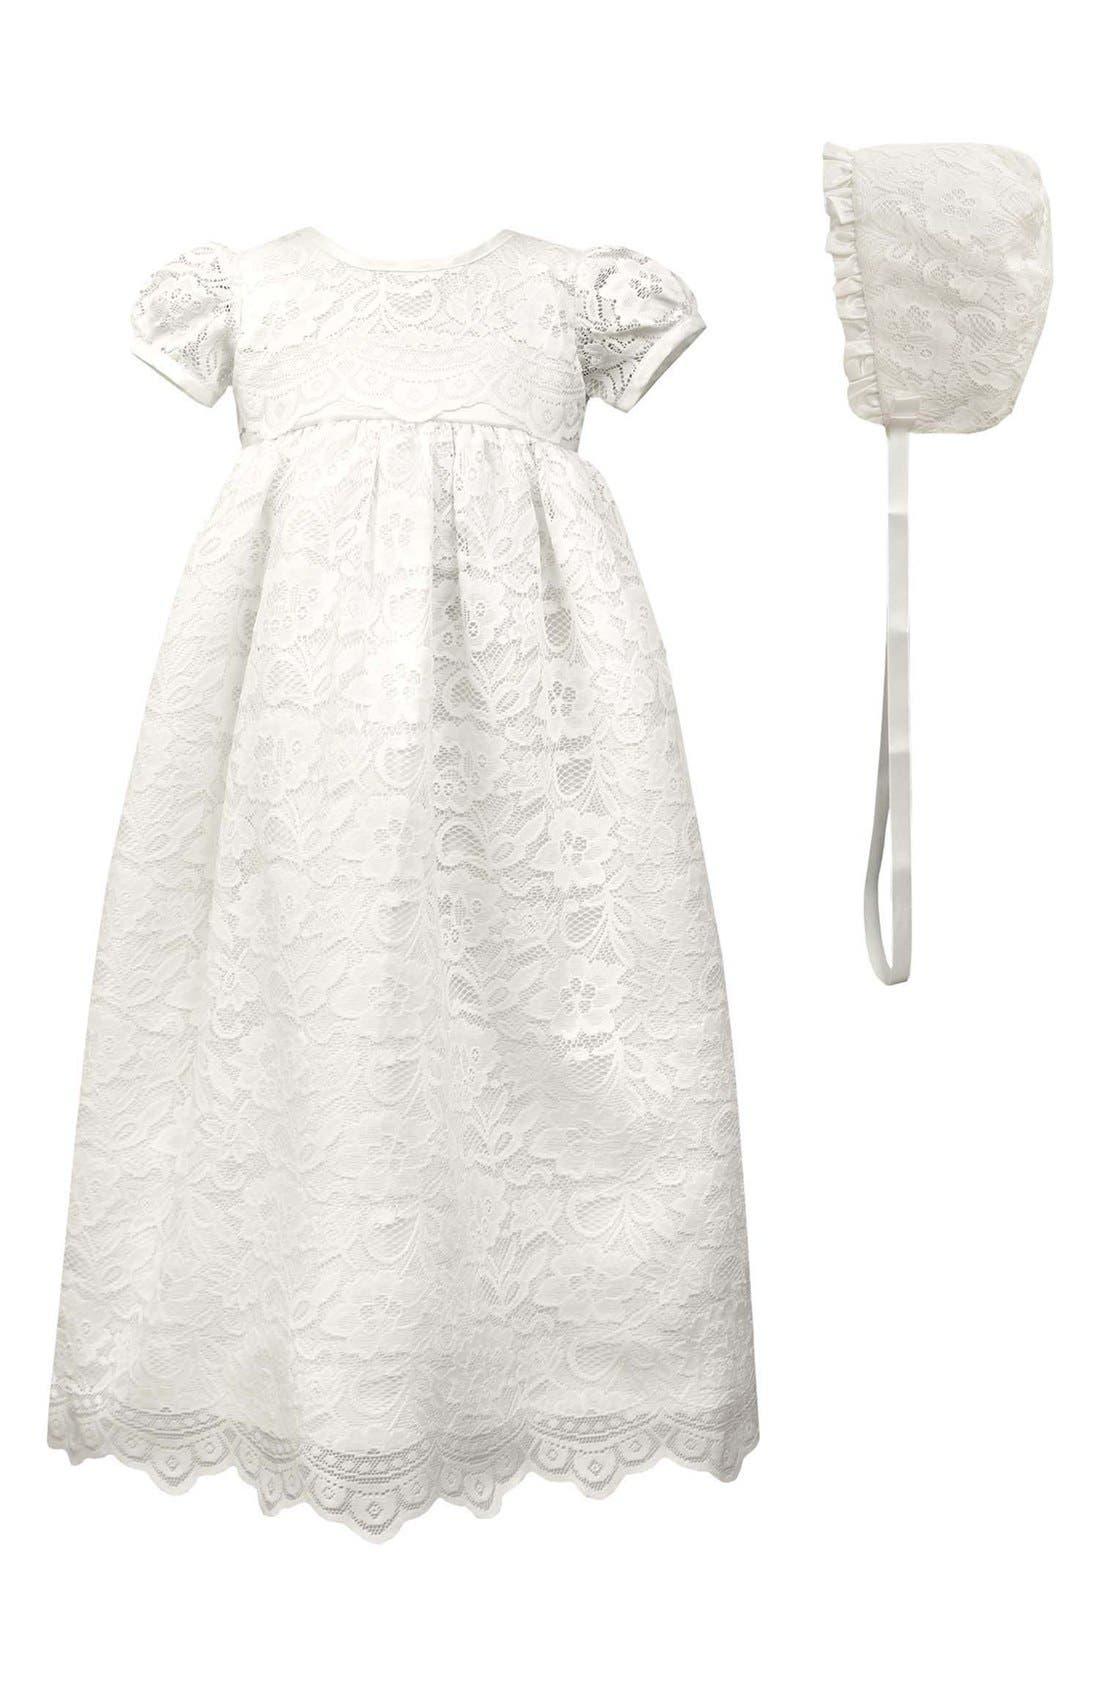 Scalloped Lace Christening Gown & Bonnet,                             Main thumbnail 1, color,                             WHITE